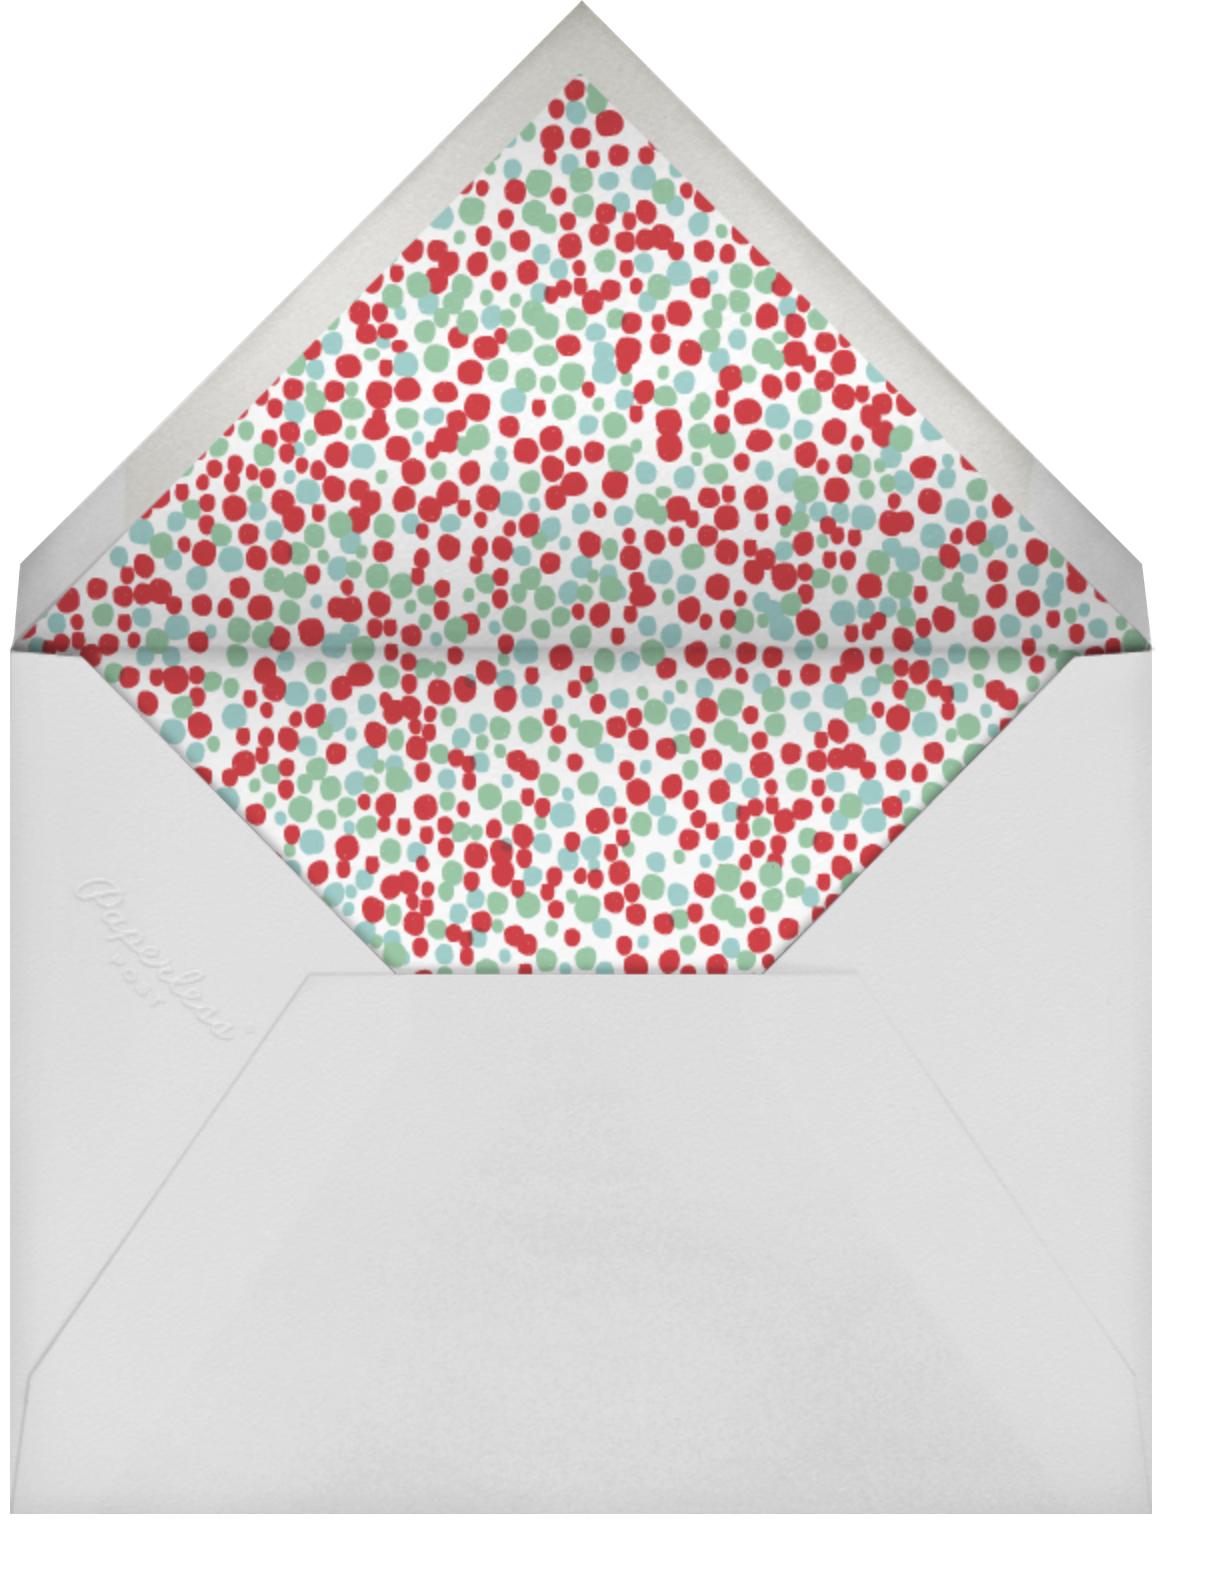 Pyramid of Happiness - Japanese Mix - Mr. Boddington's Studio - New Year - envelope back